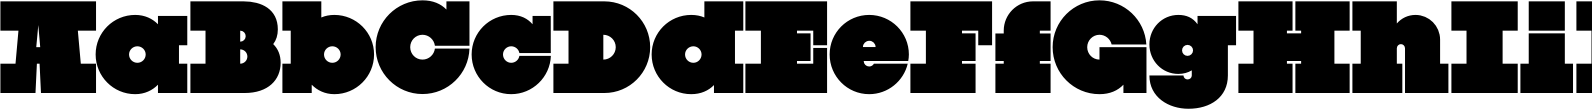 Slab Serif Collection 01